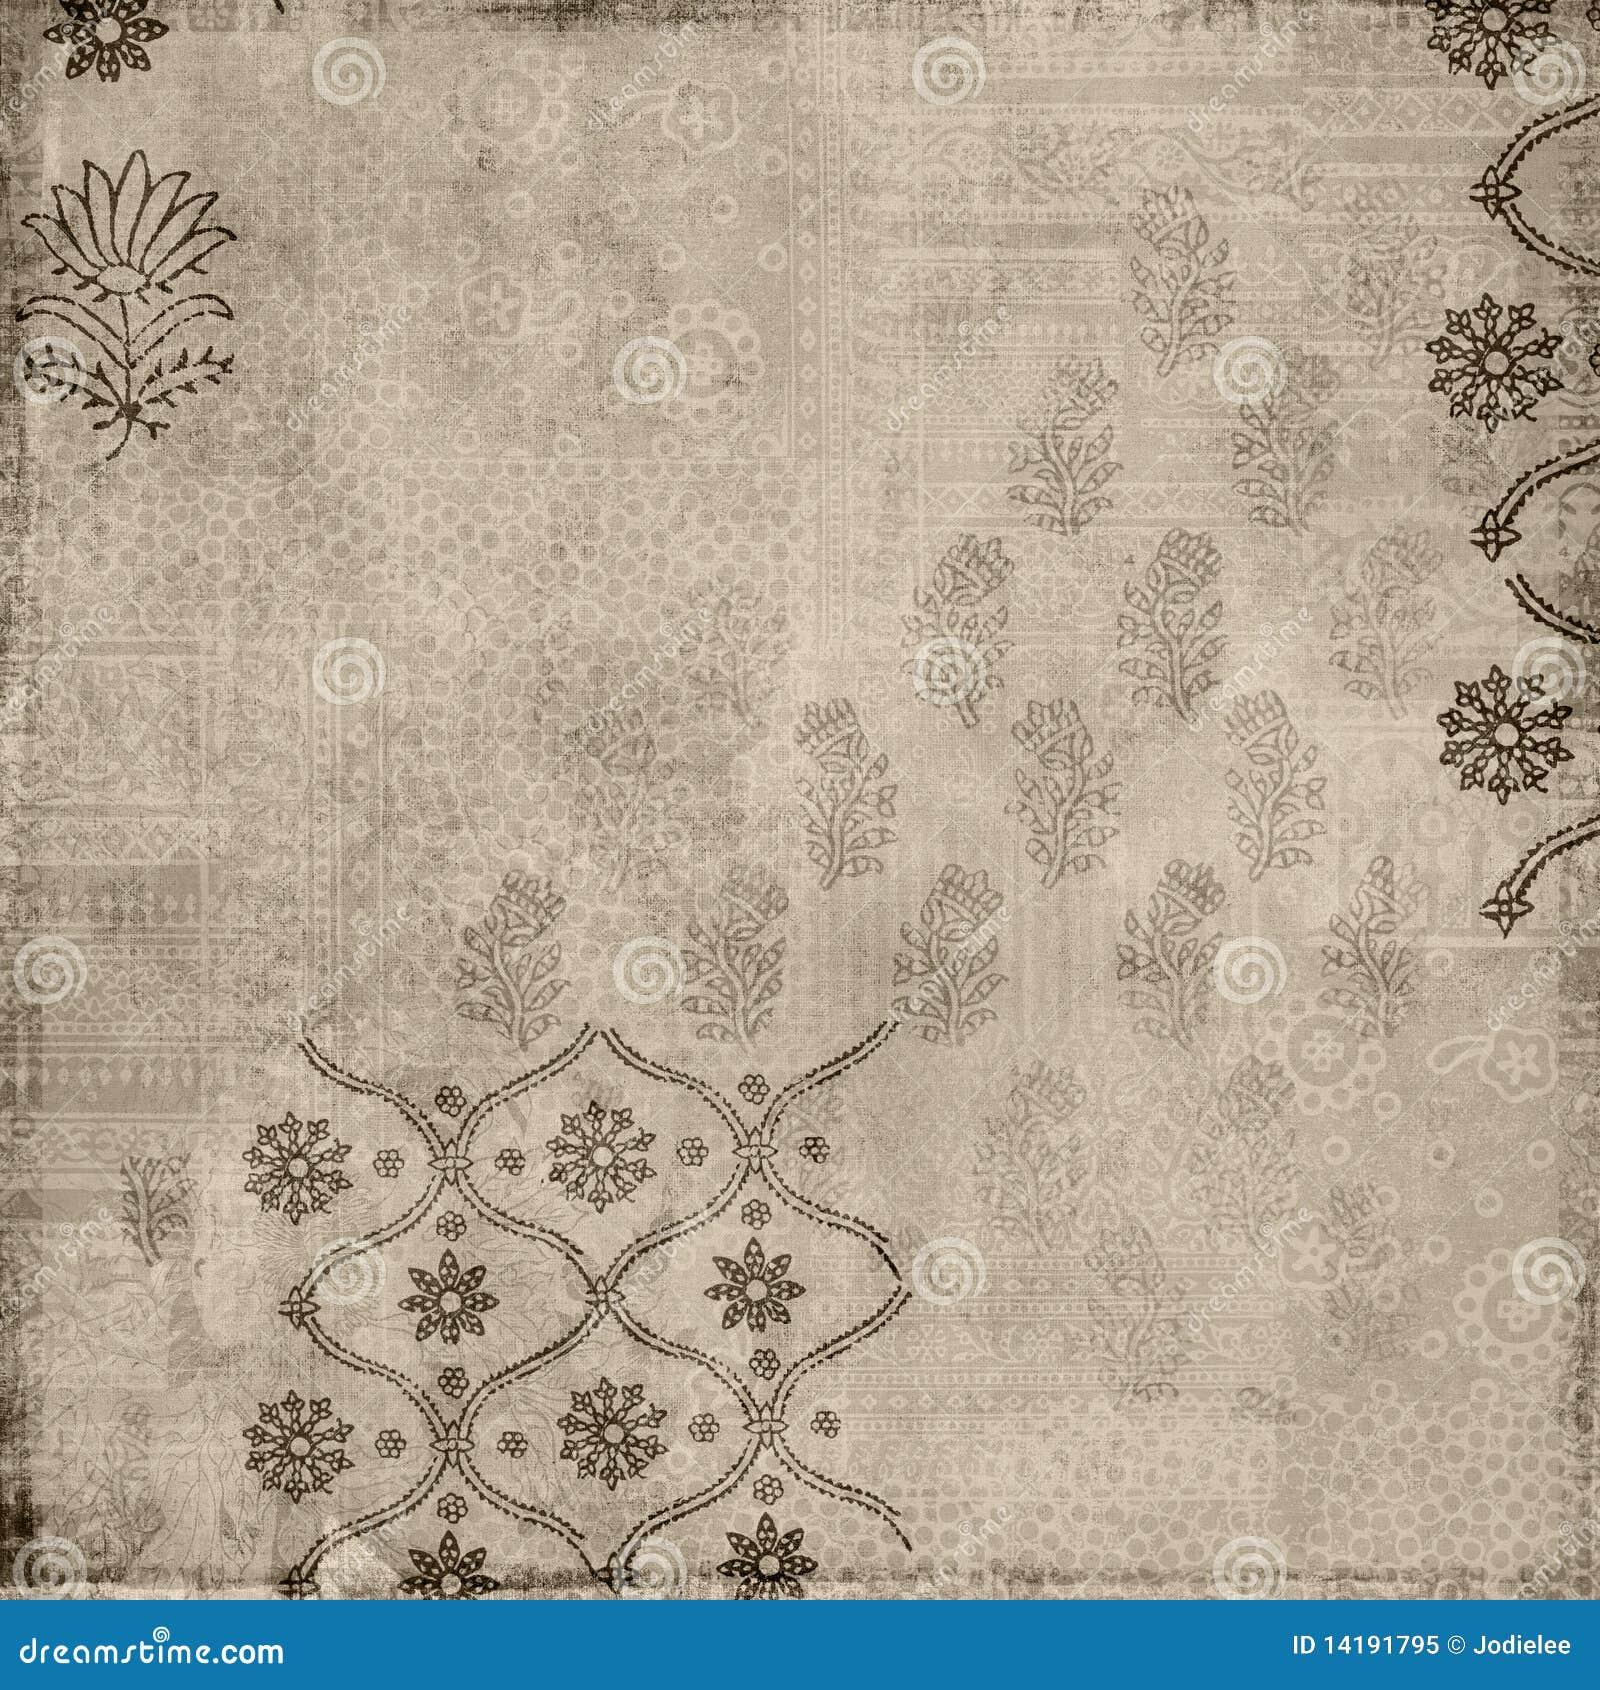 Brown Floral Vintage Style Batik Stamp Background Royalty